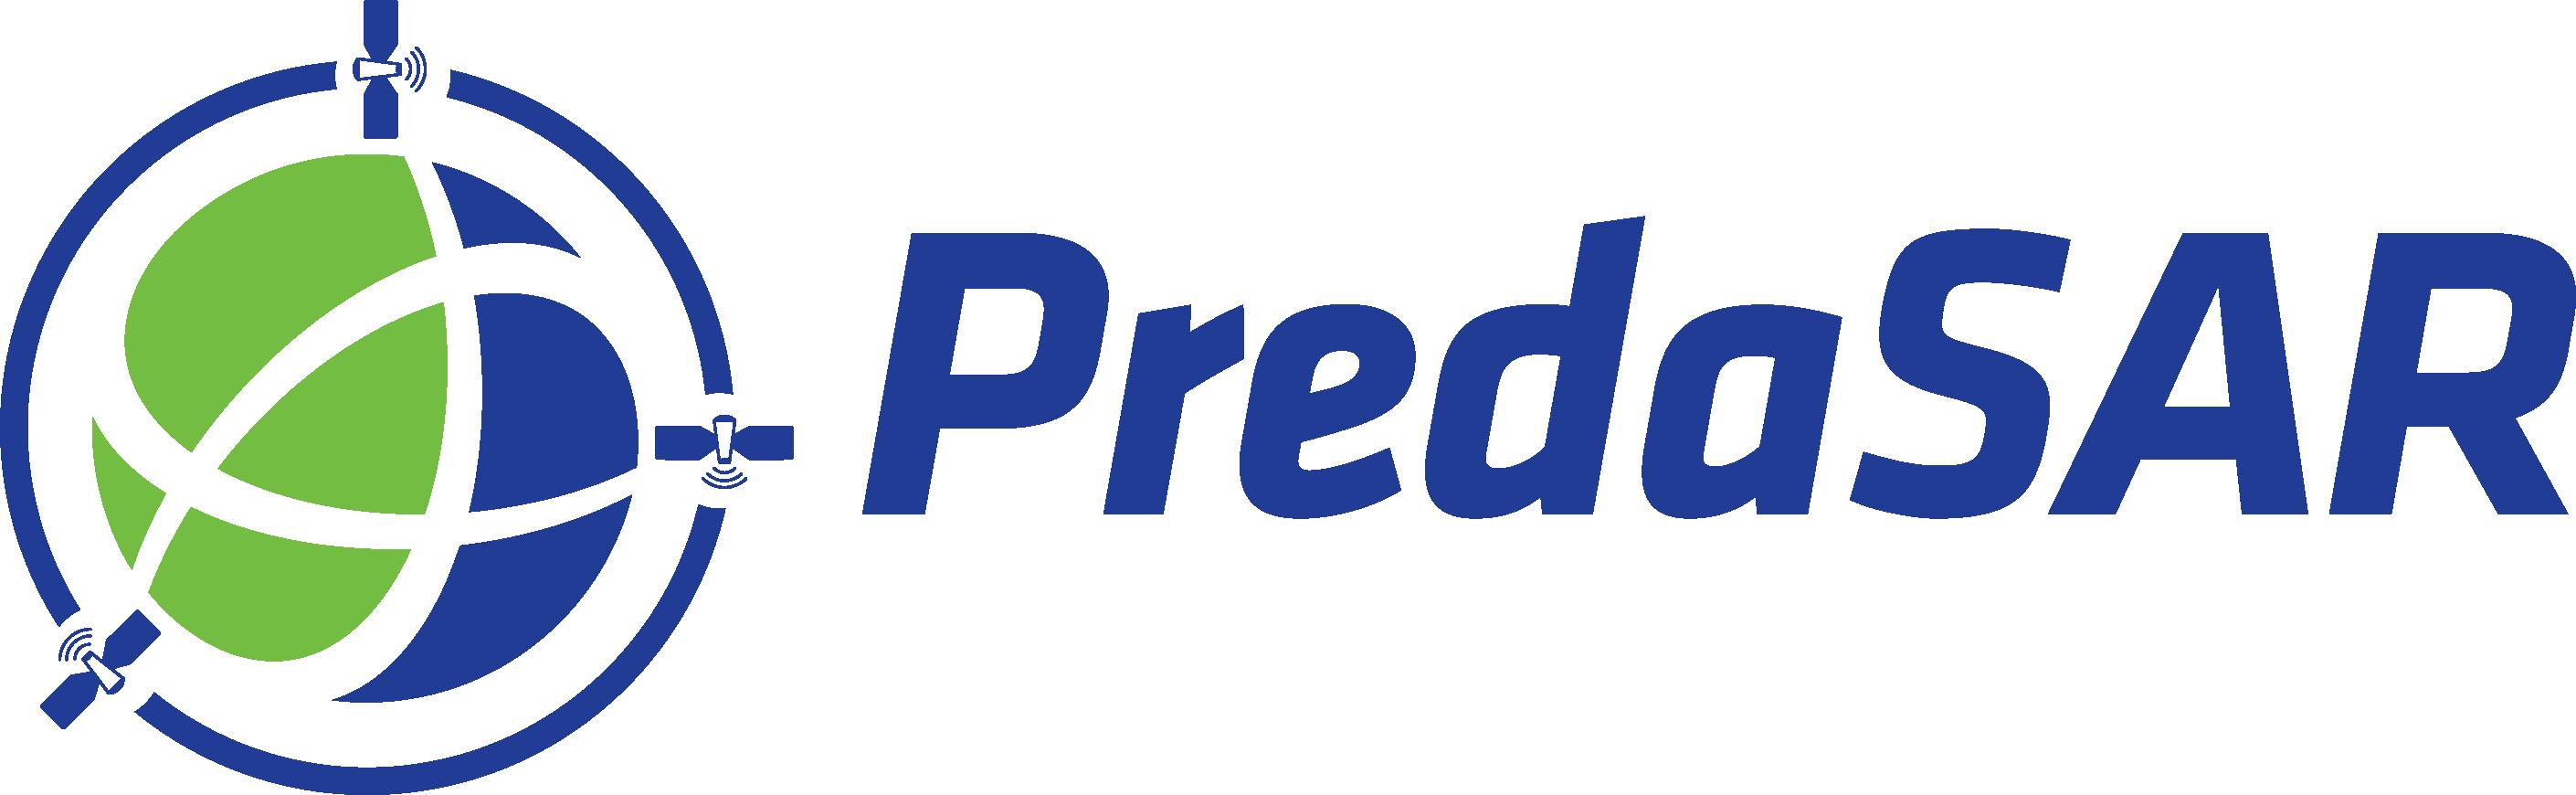 PredaSAR Corporation